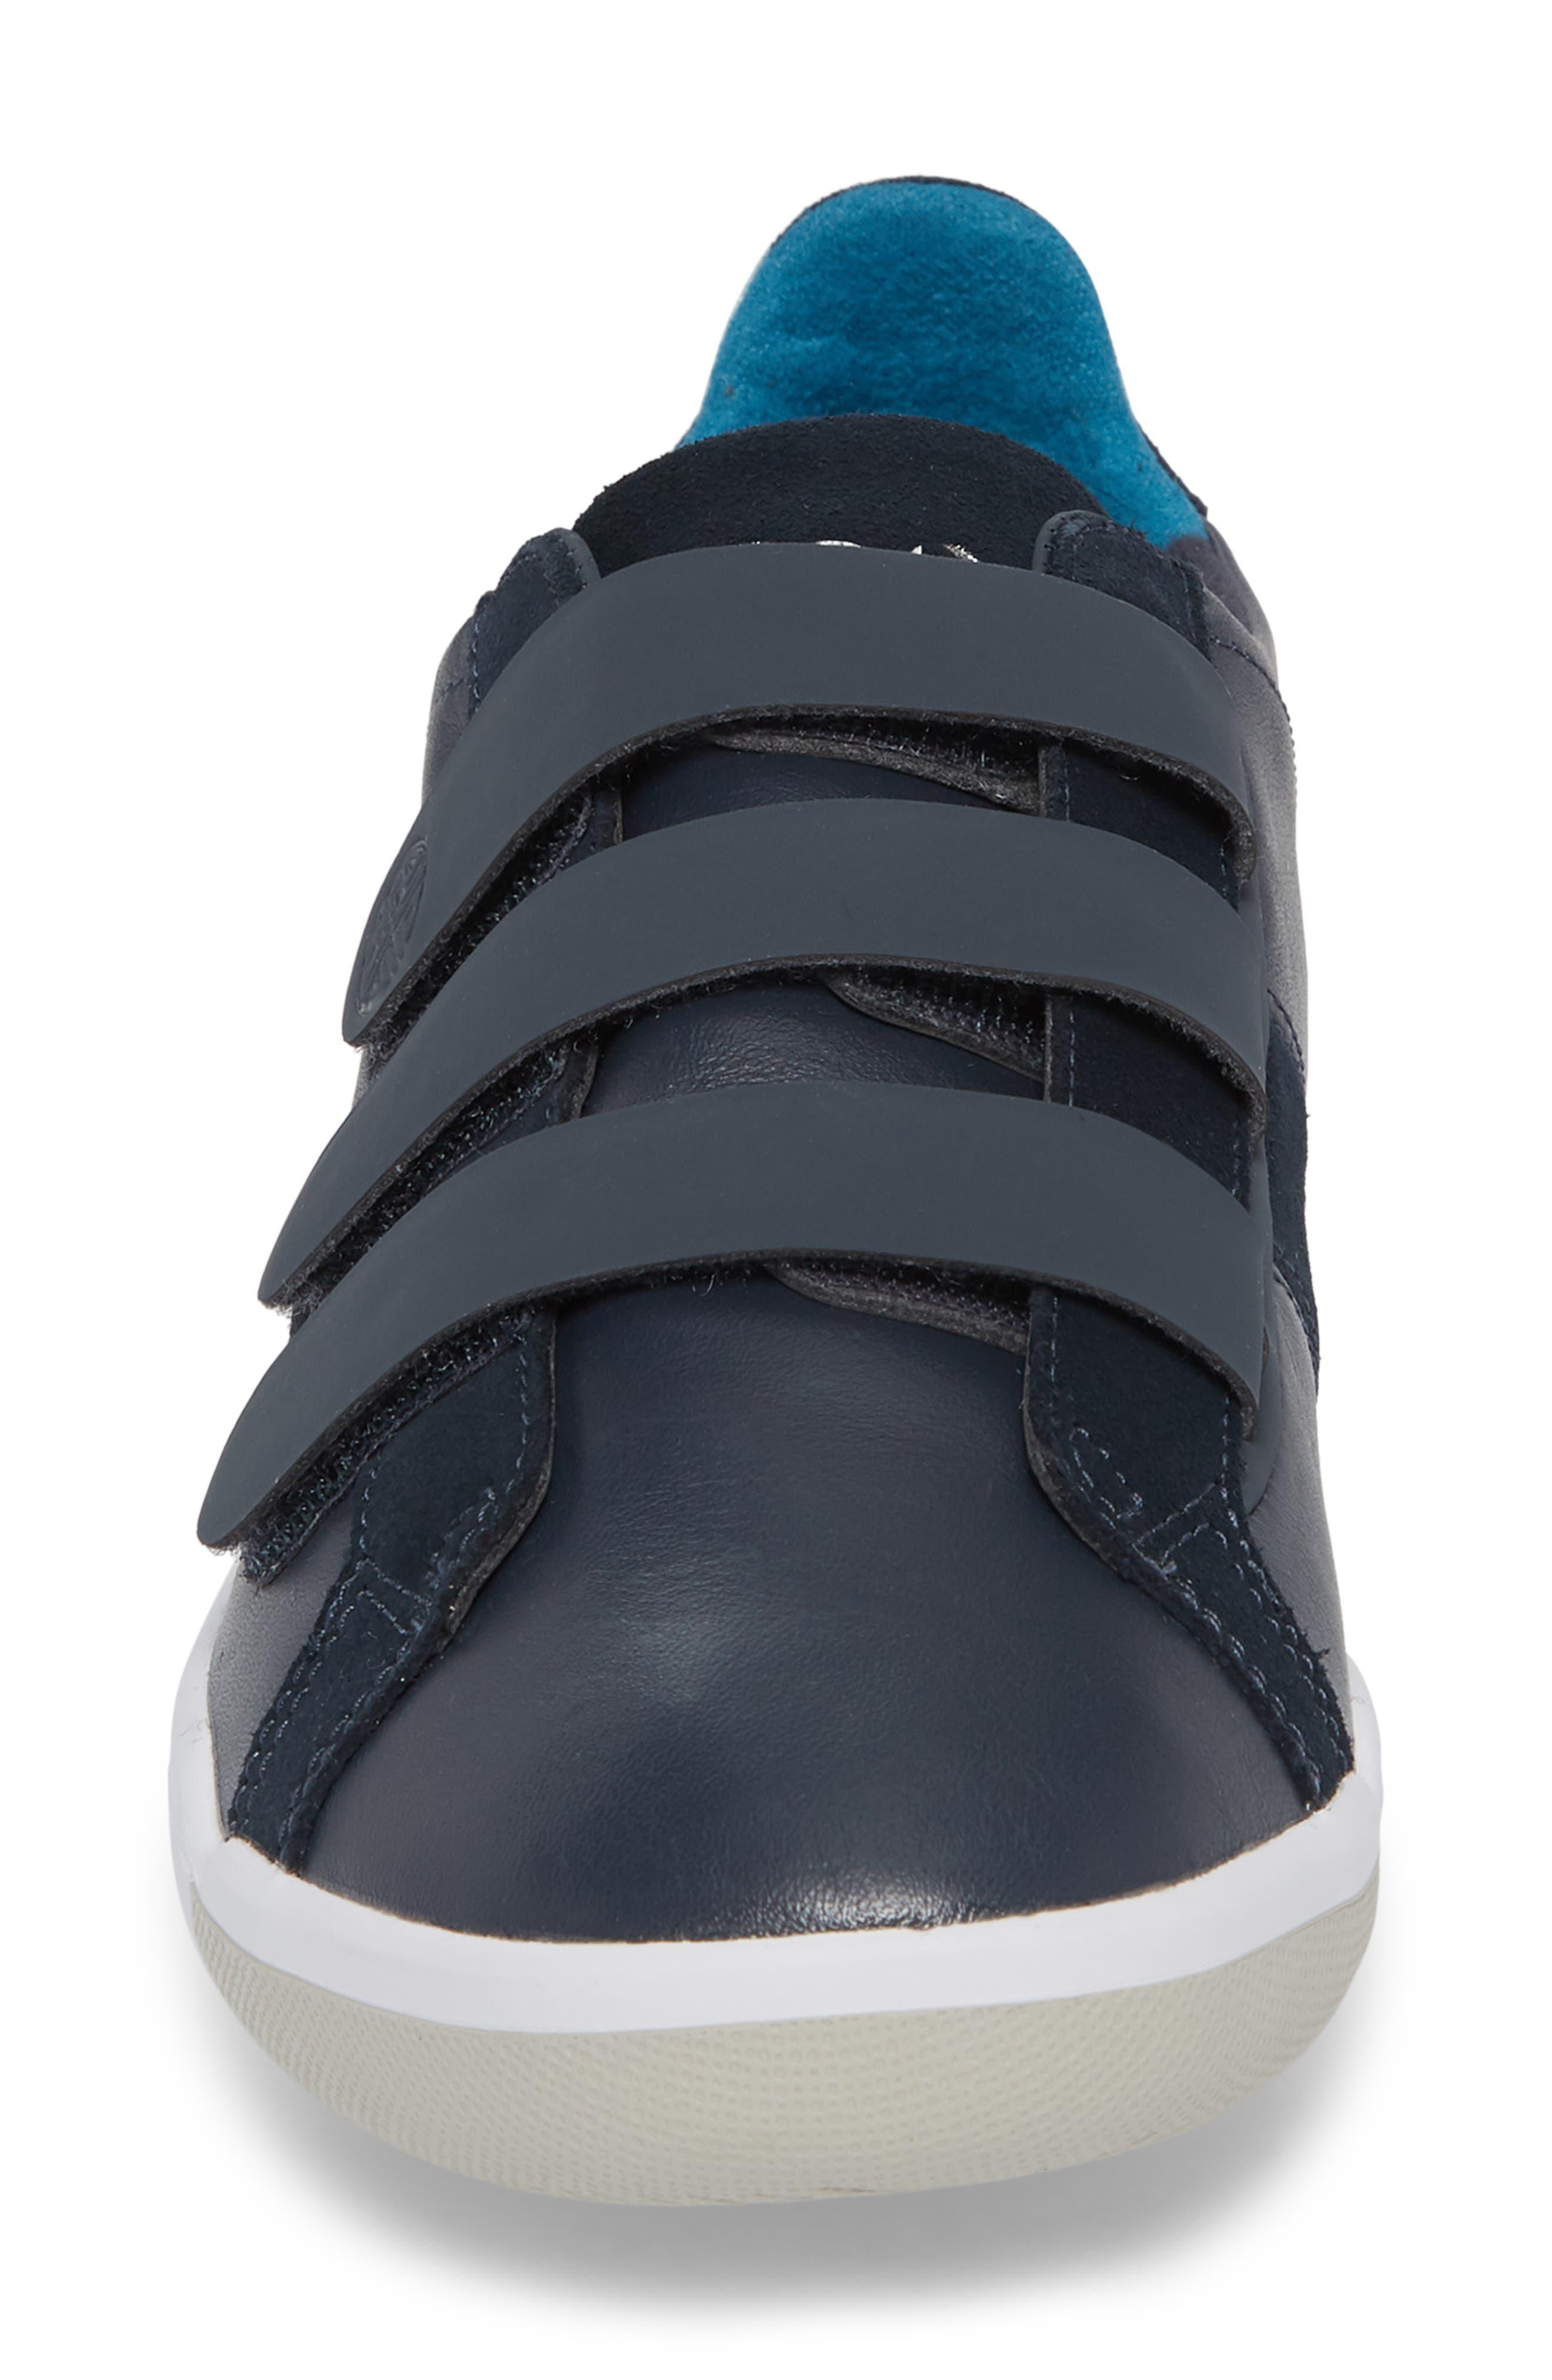 Larkin Low Top Sneaker,                             Alternate thumbnail 4, color,                             Blue Nights